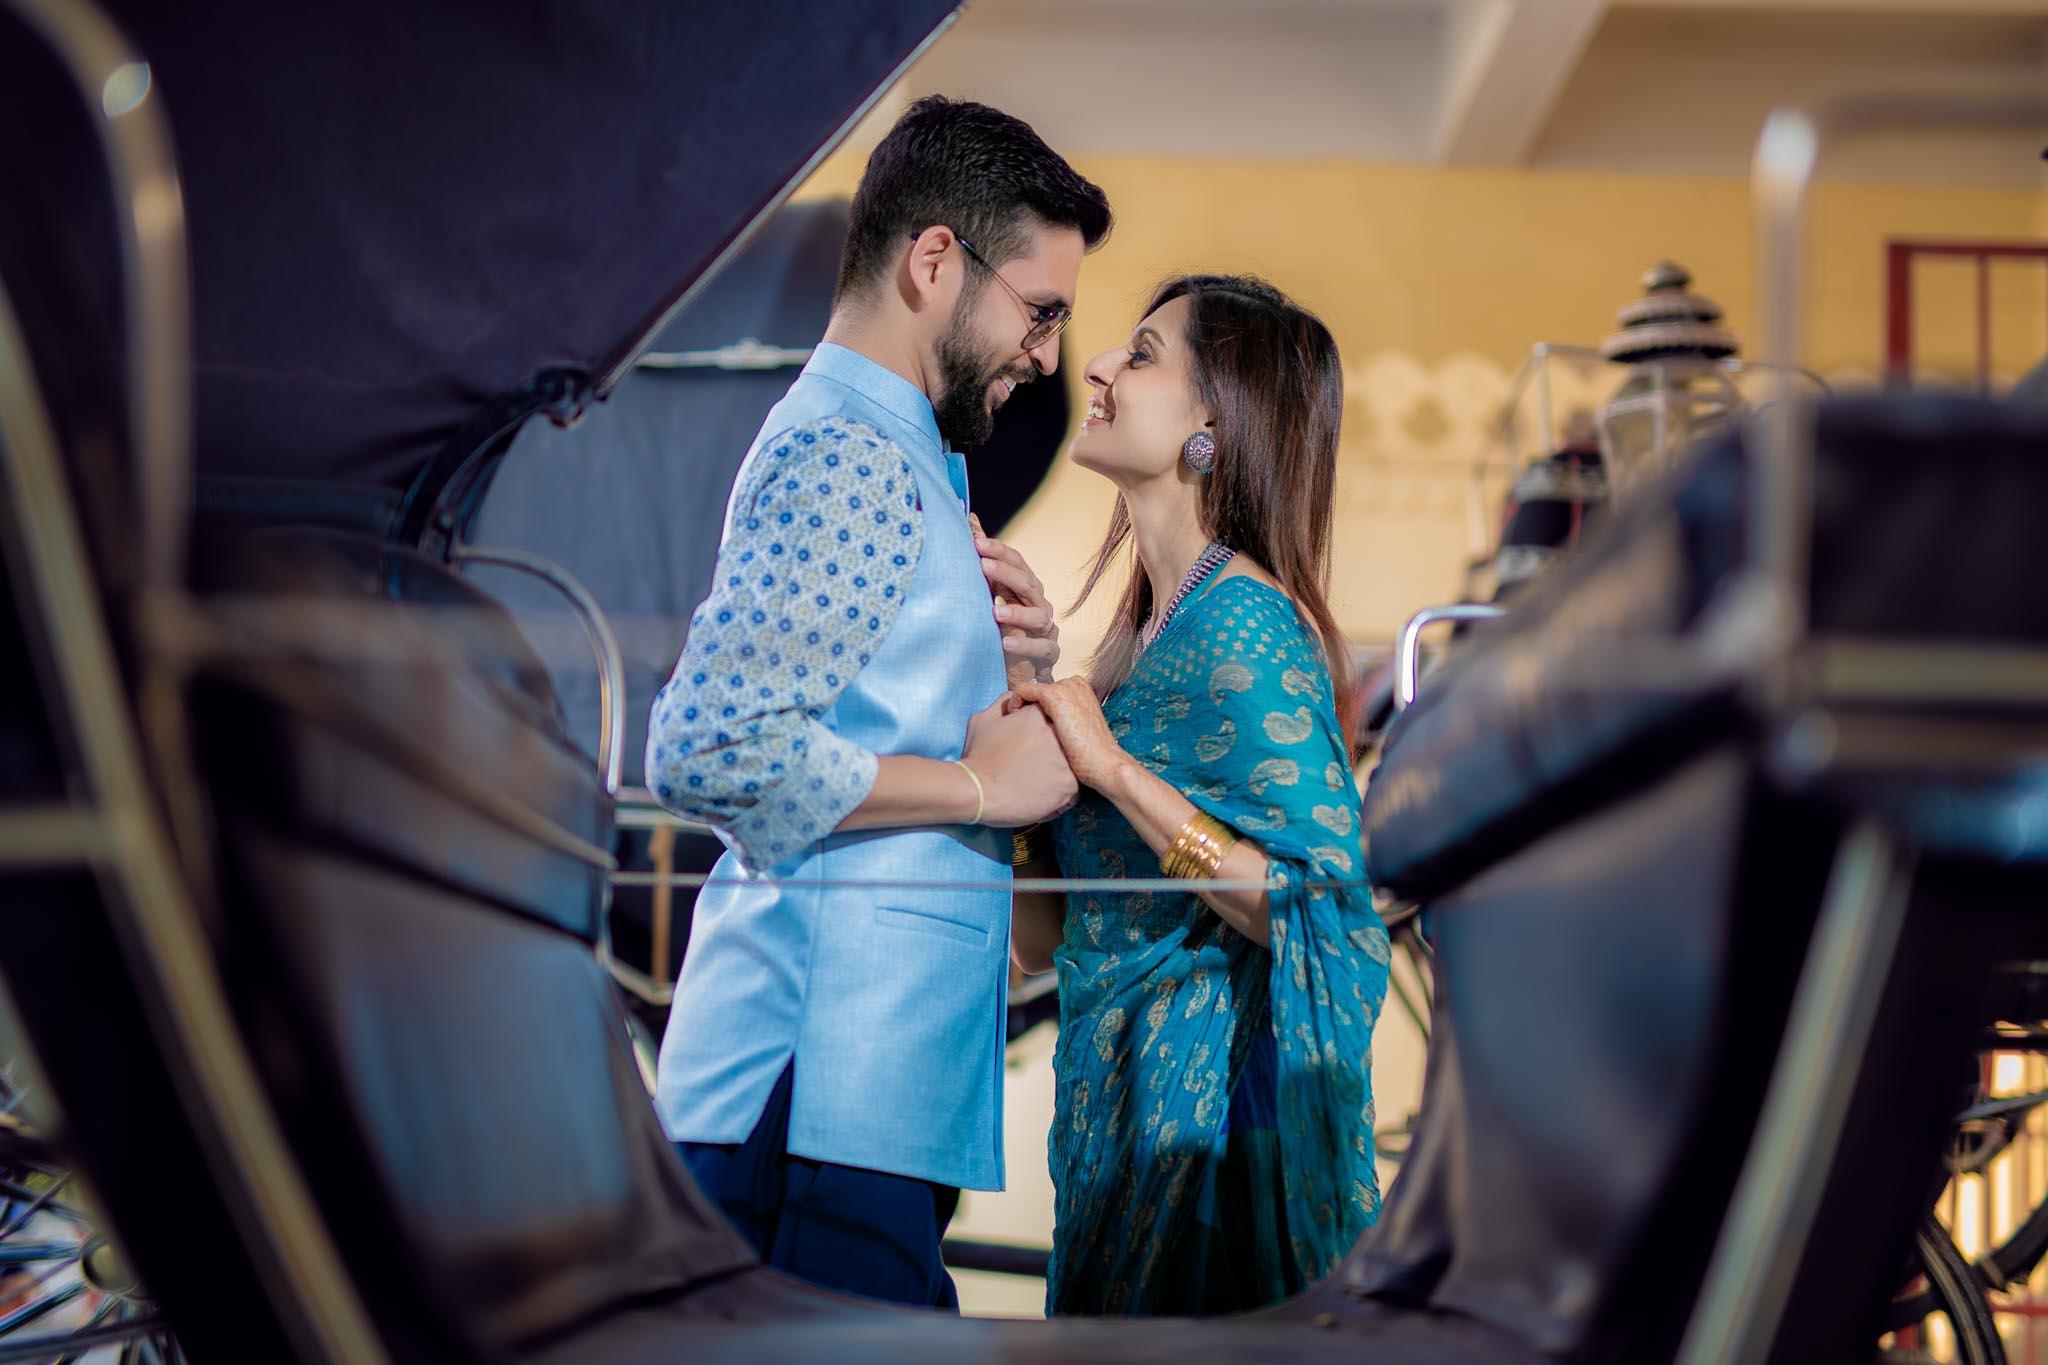 Best-of-2018-wedding-photography-focuz-studios-67